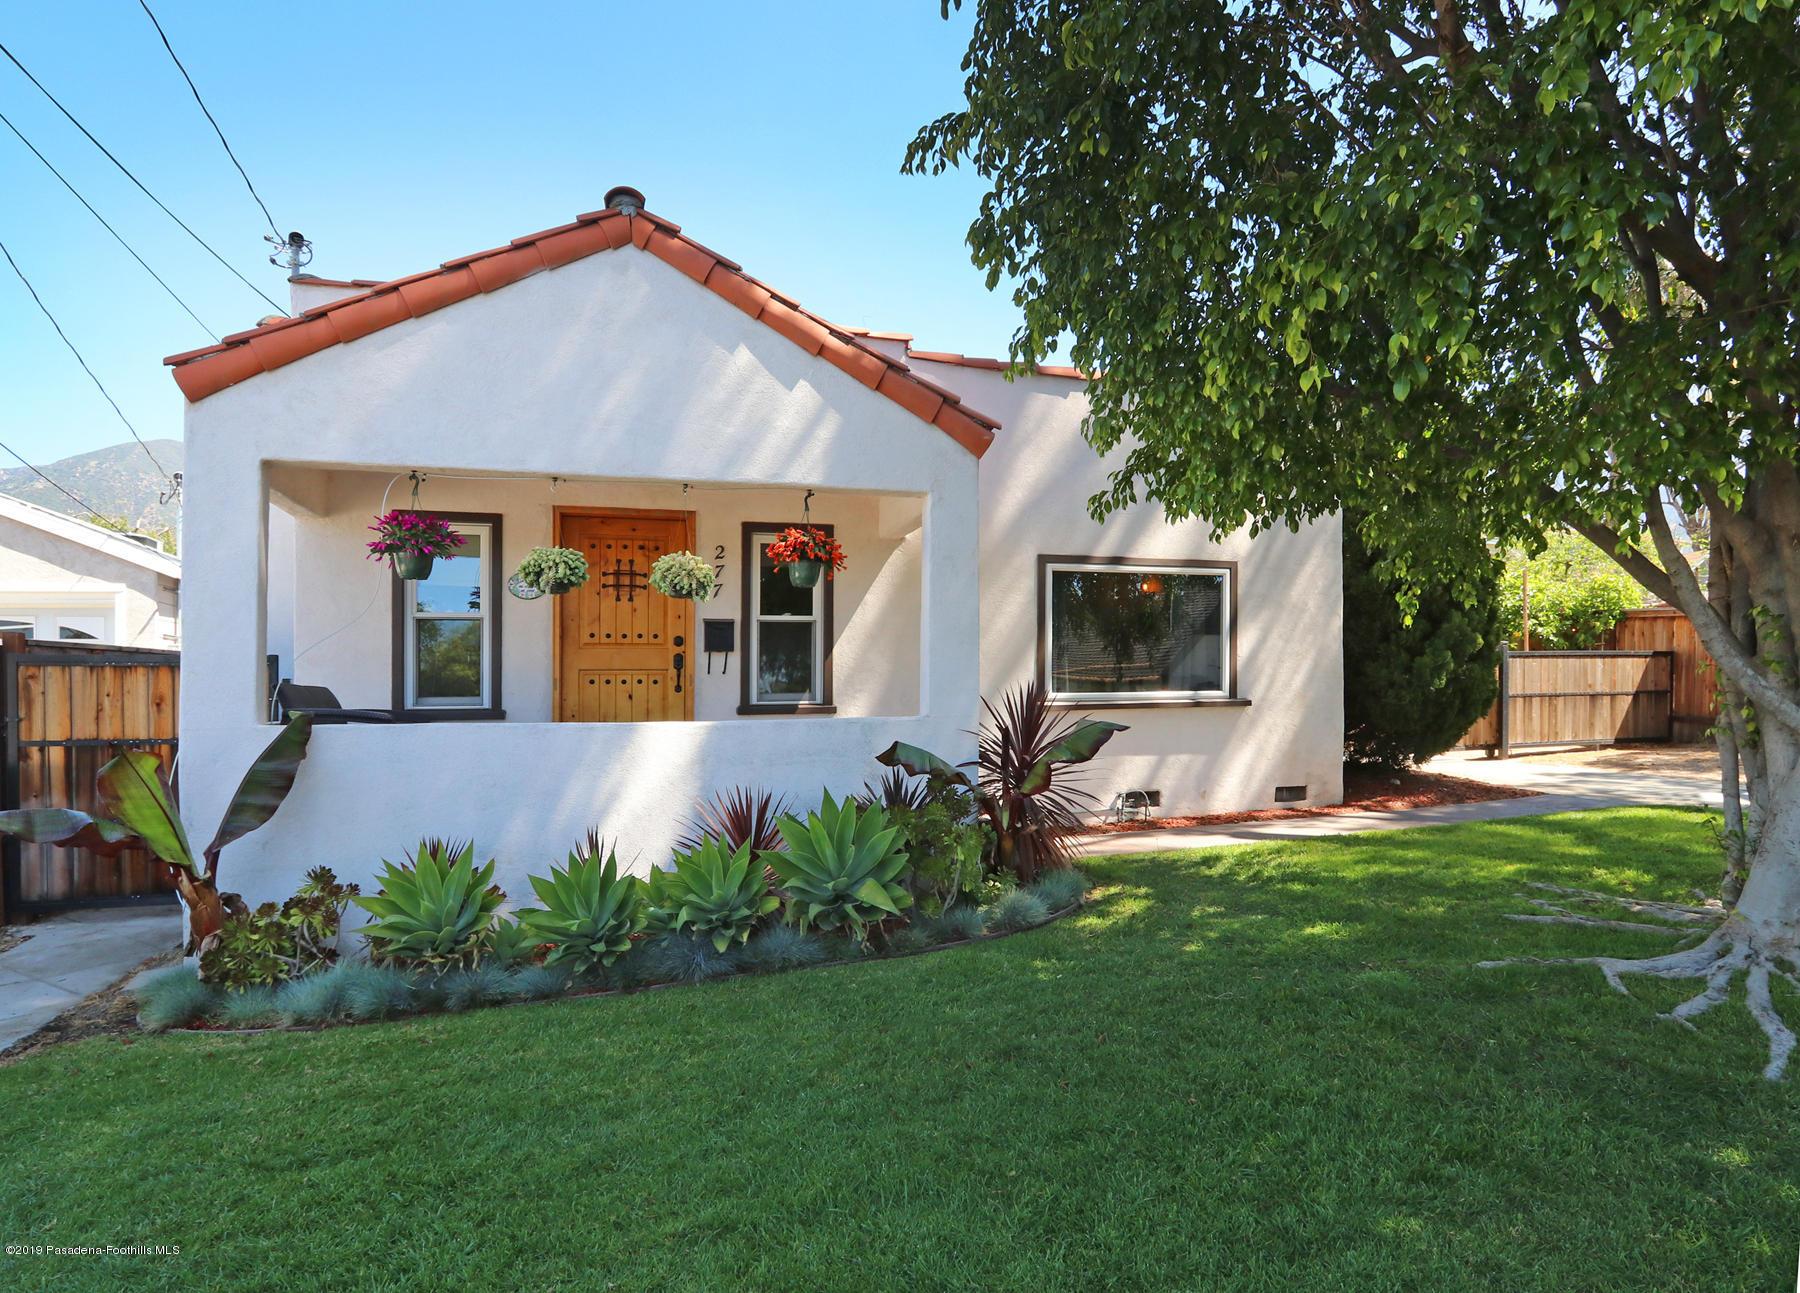 277 W Poppyfields Drive, Altadena in Los Angeles County, CA 91001 Home for Sale